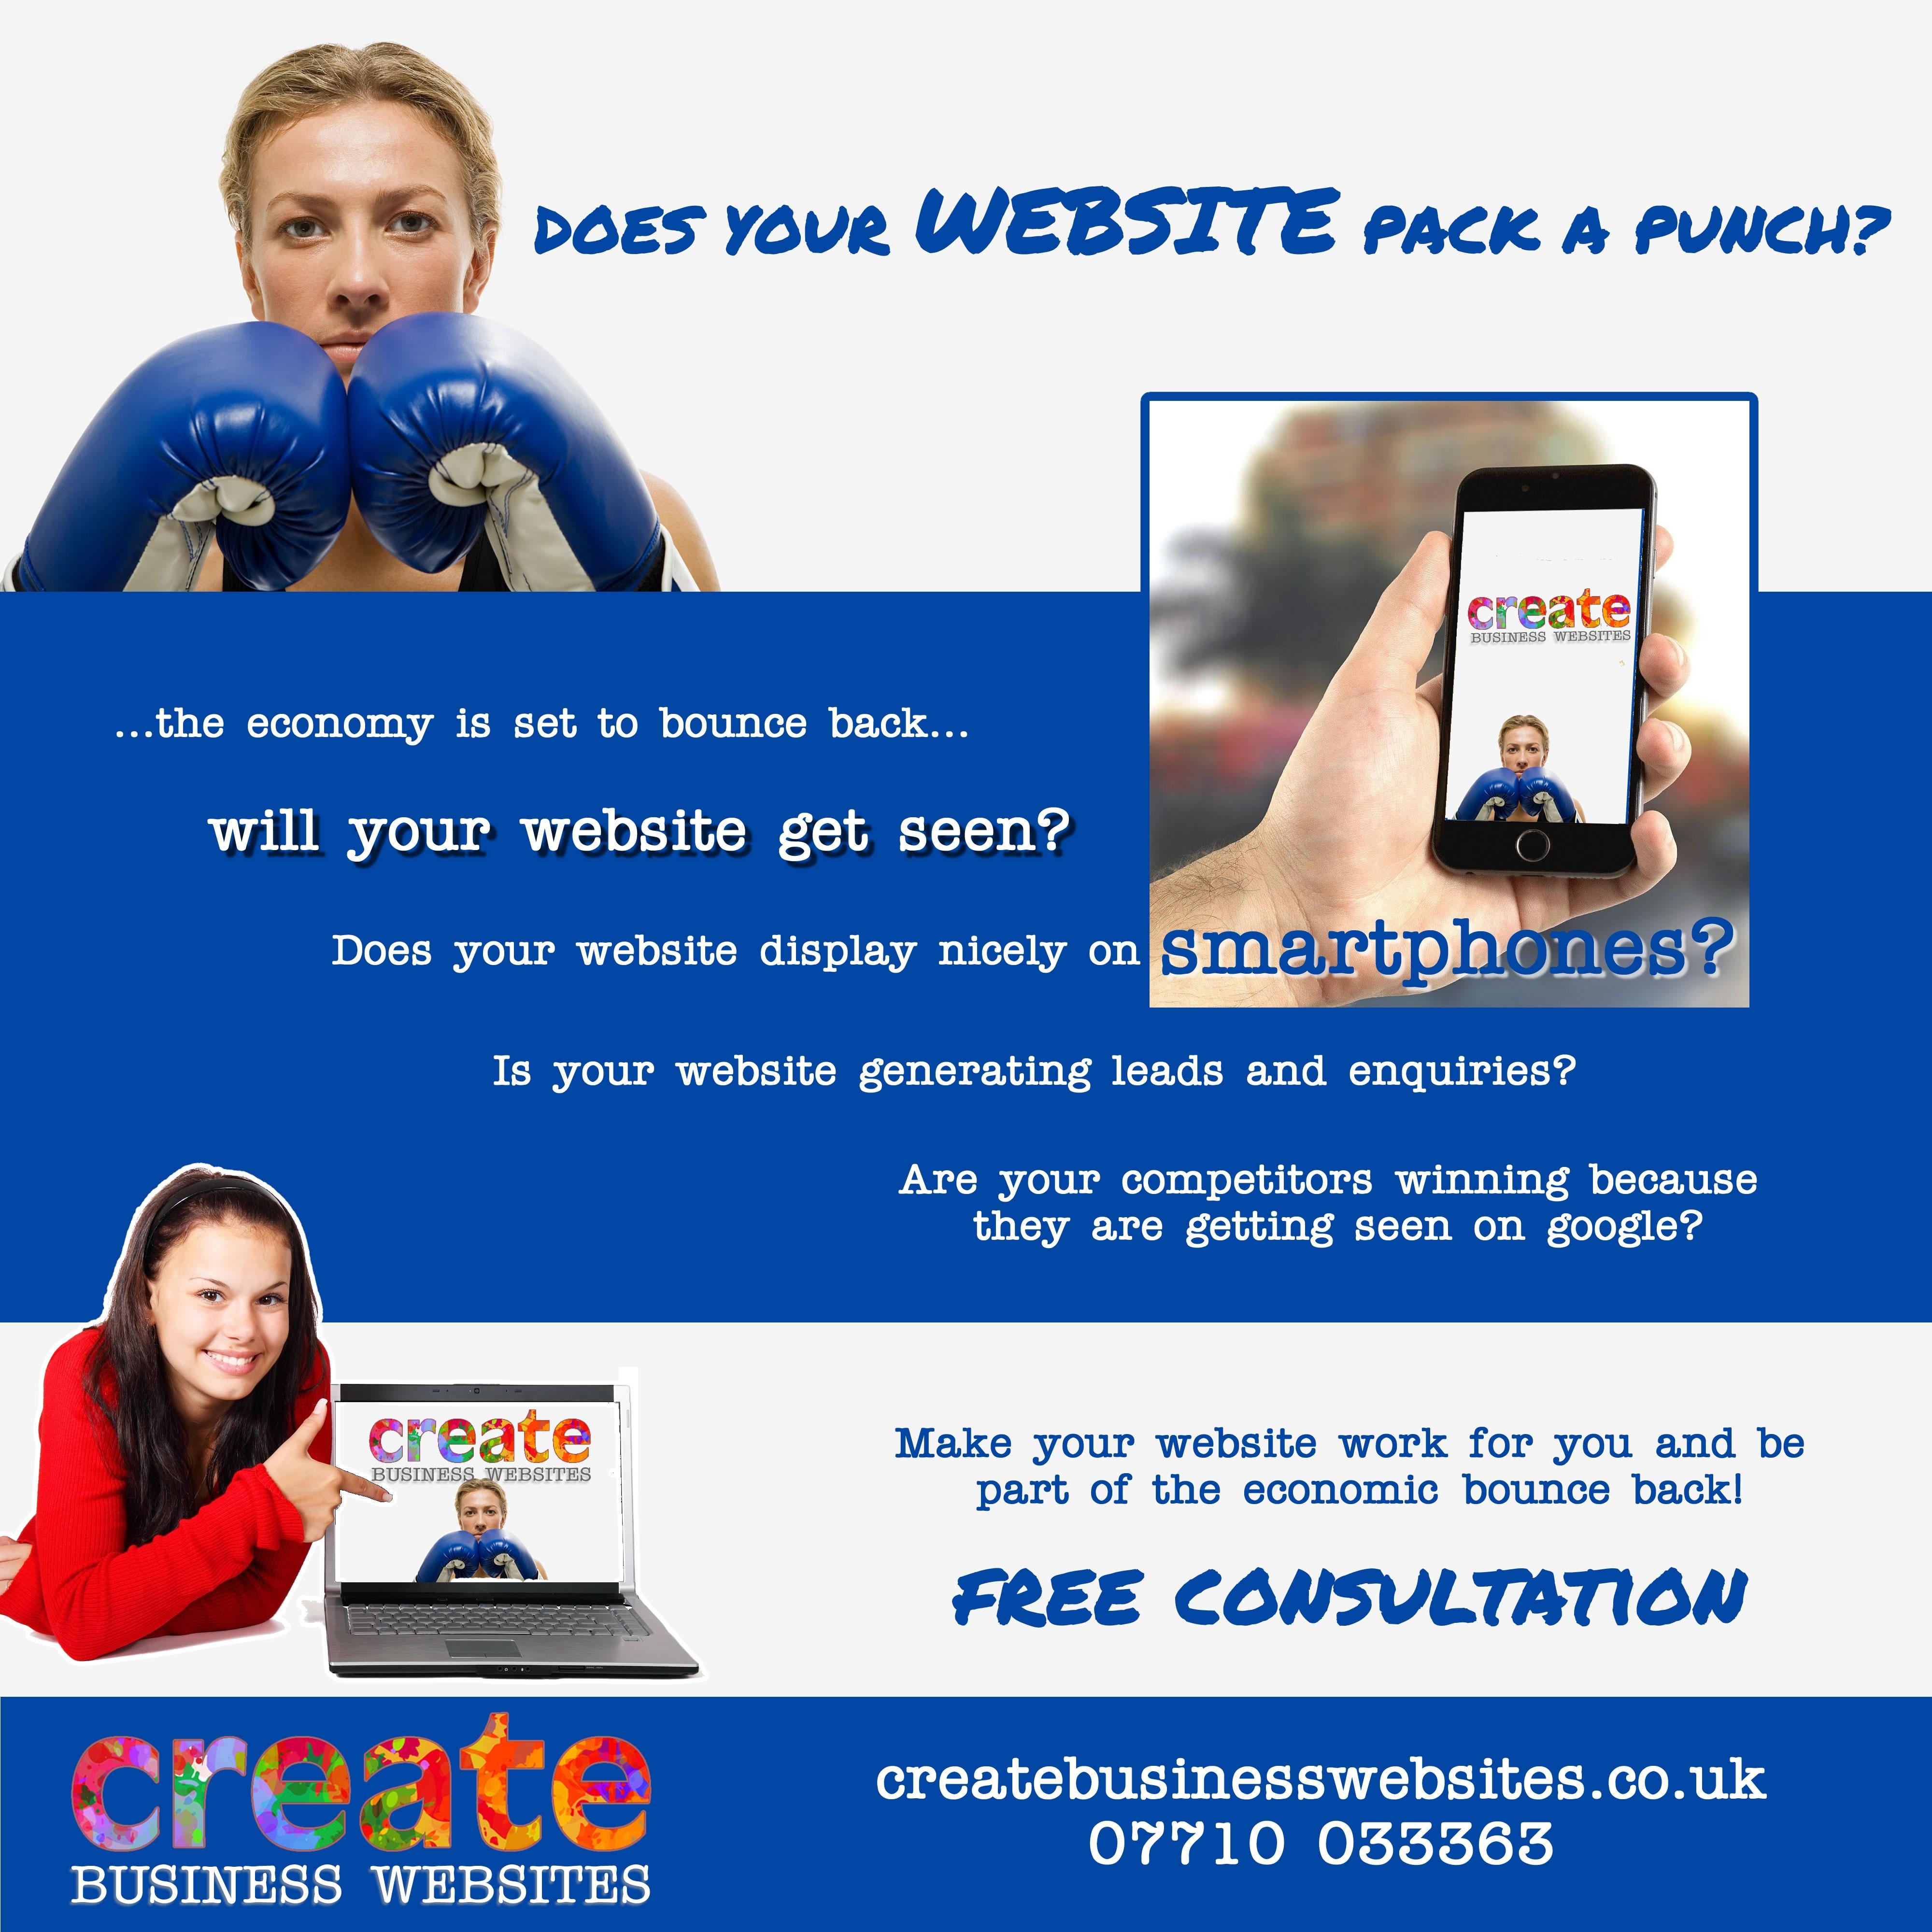 Create Business Websites